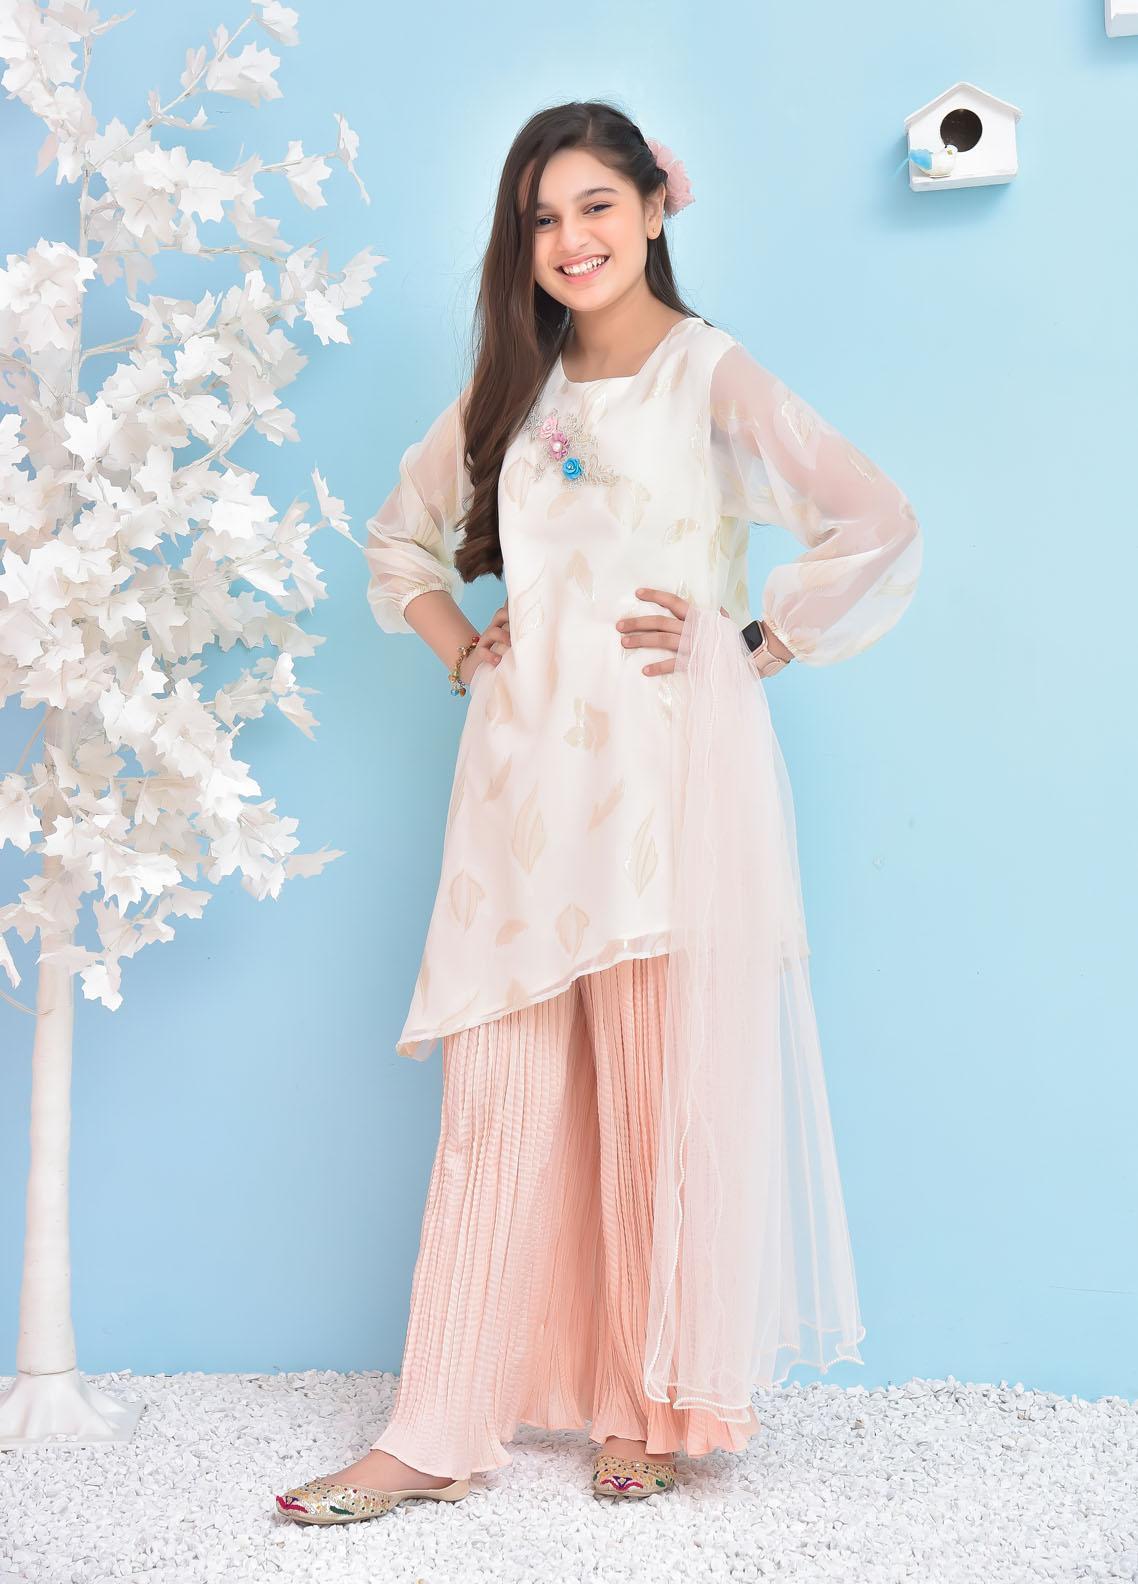 Ochre Silk Fancy 3 Piece Suit for Girls -  OFW-338 Off White